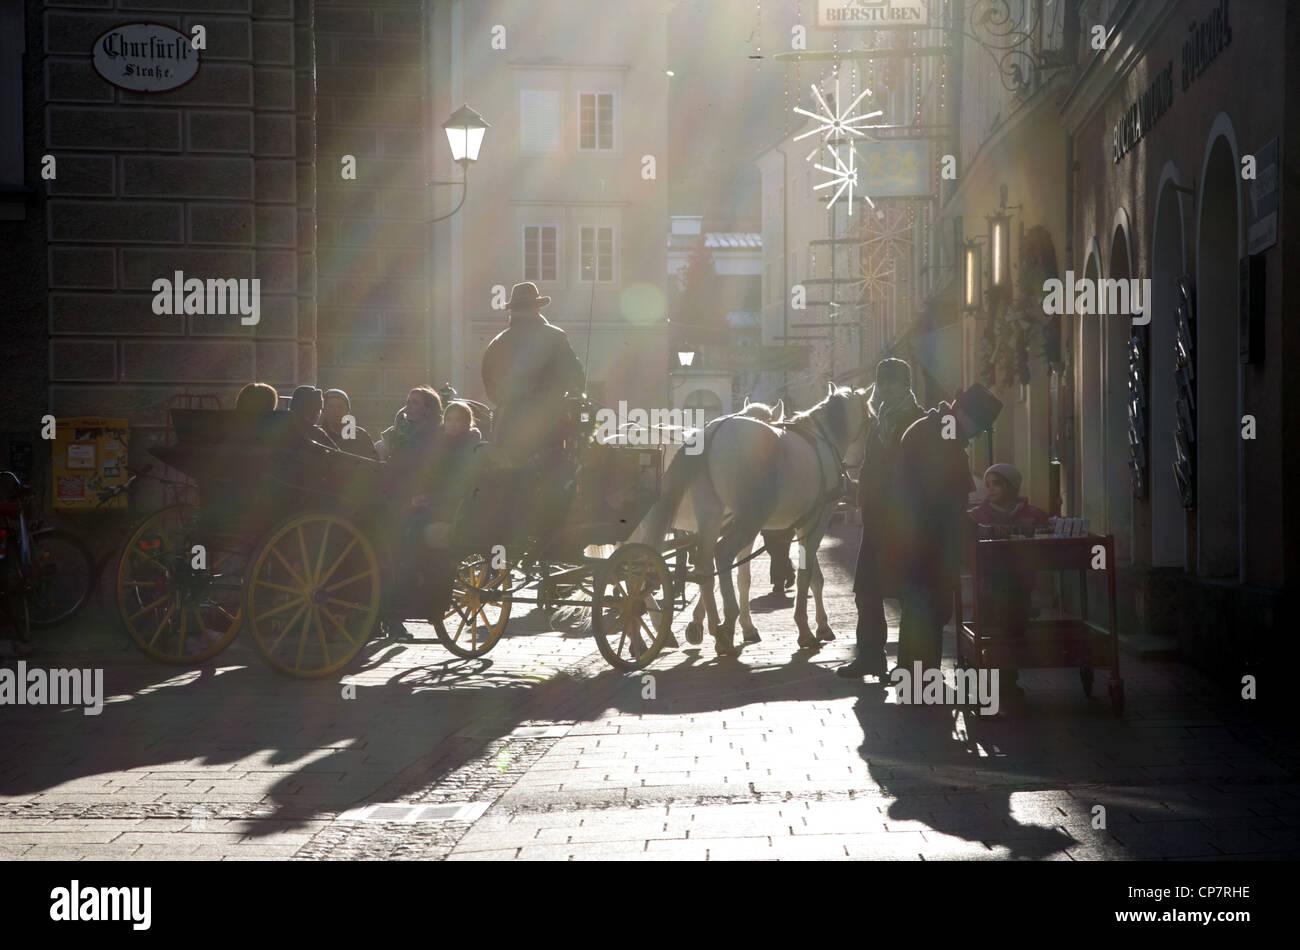 SUN RAYS ON HORSE & CARRAIGE CHURFURSTSTRASSE SALZBURG AUSTRIA 27 December 2011 - Stock Image